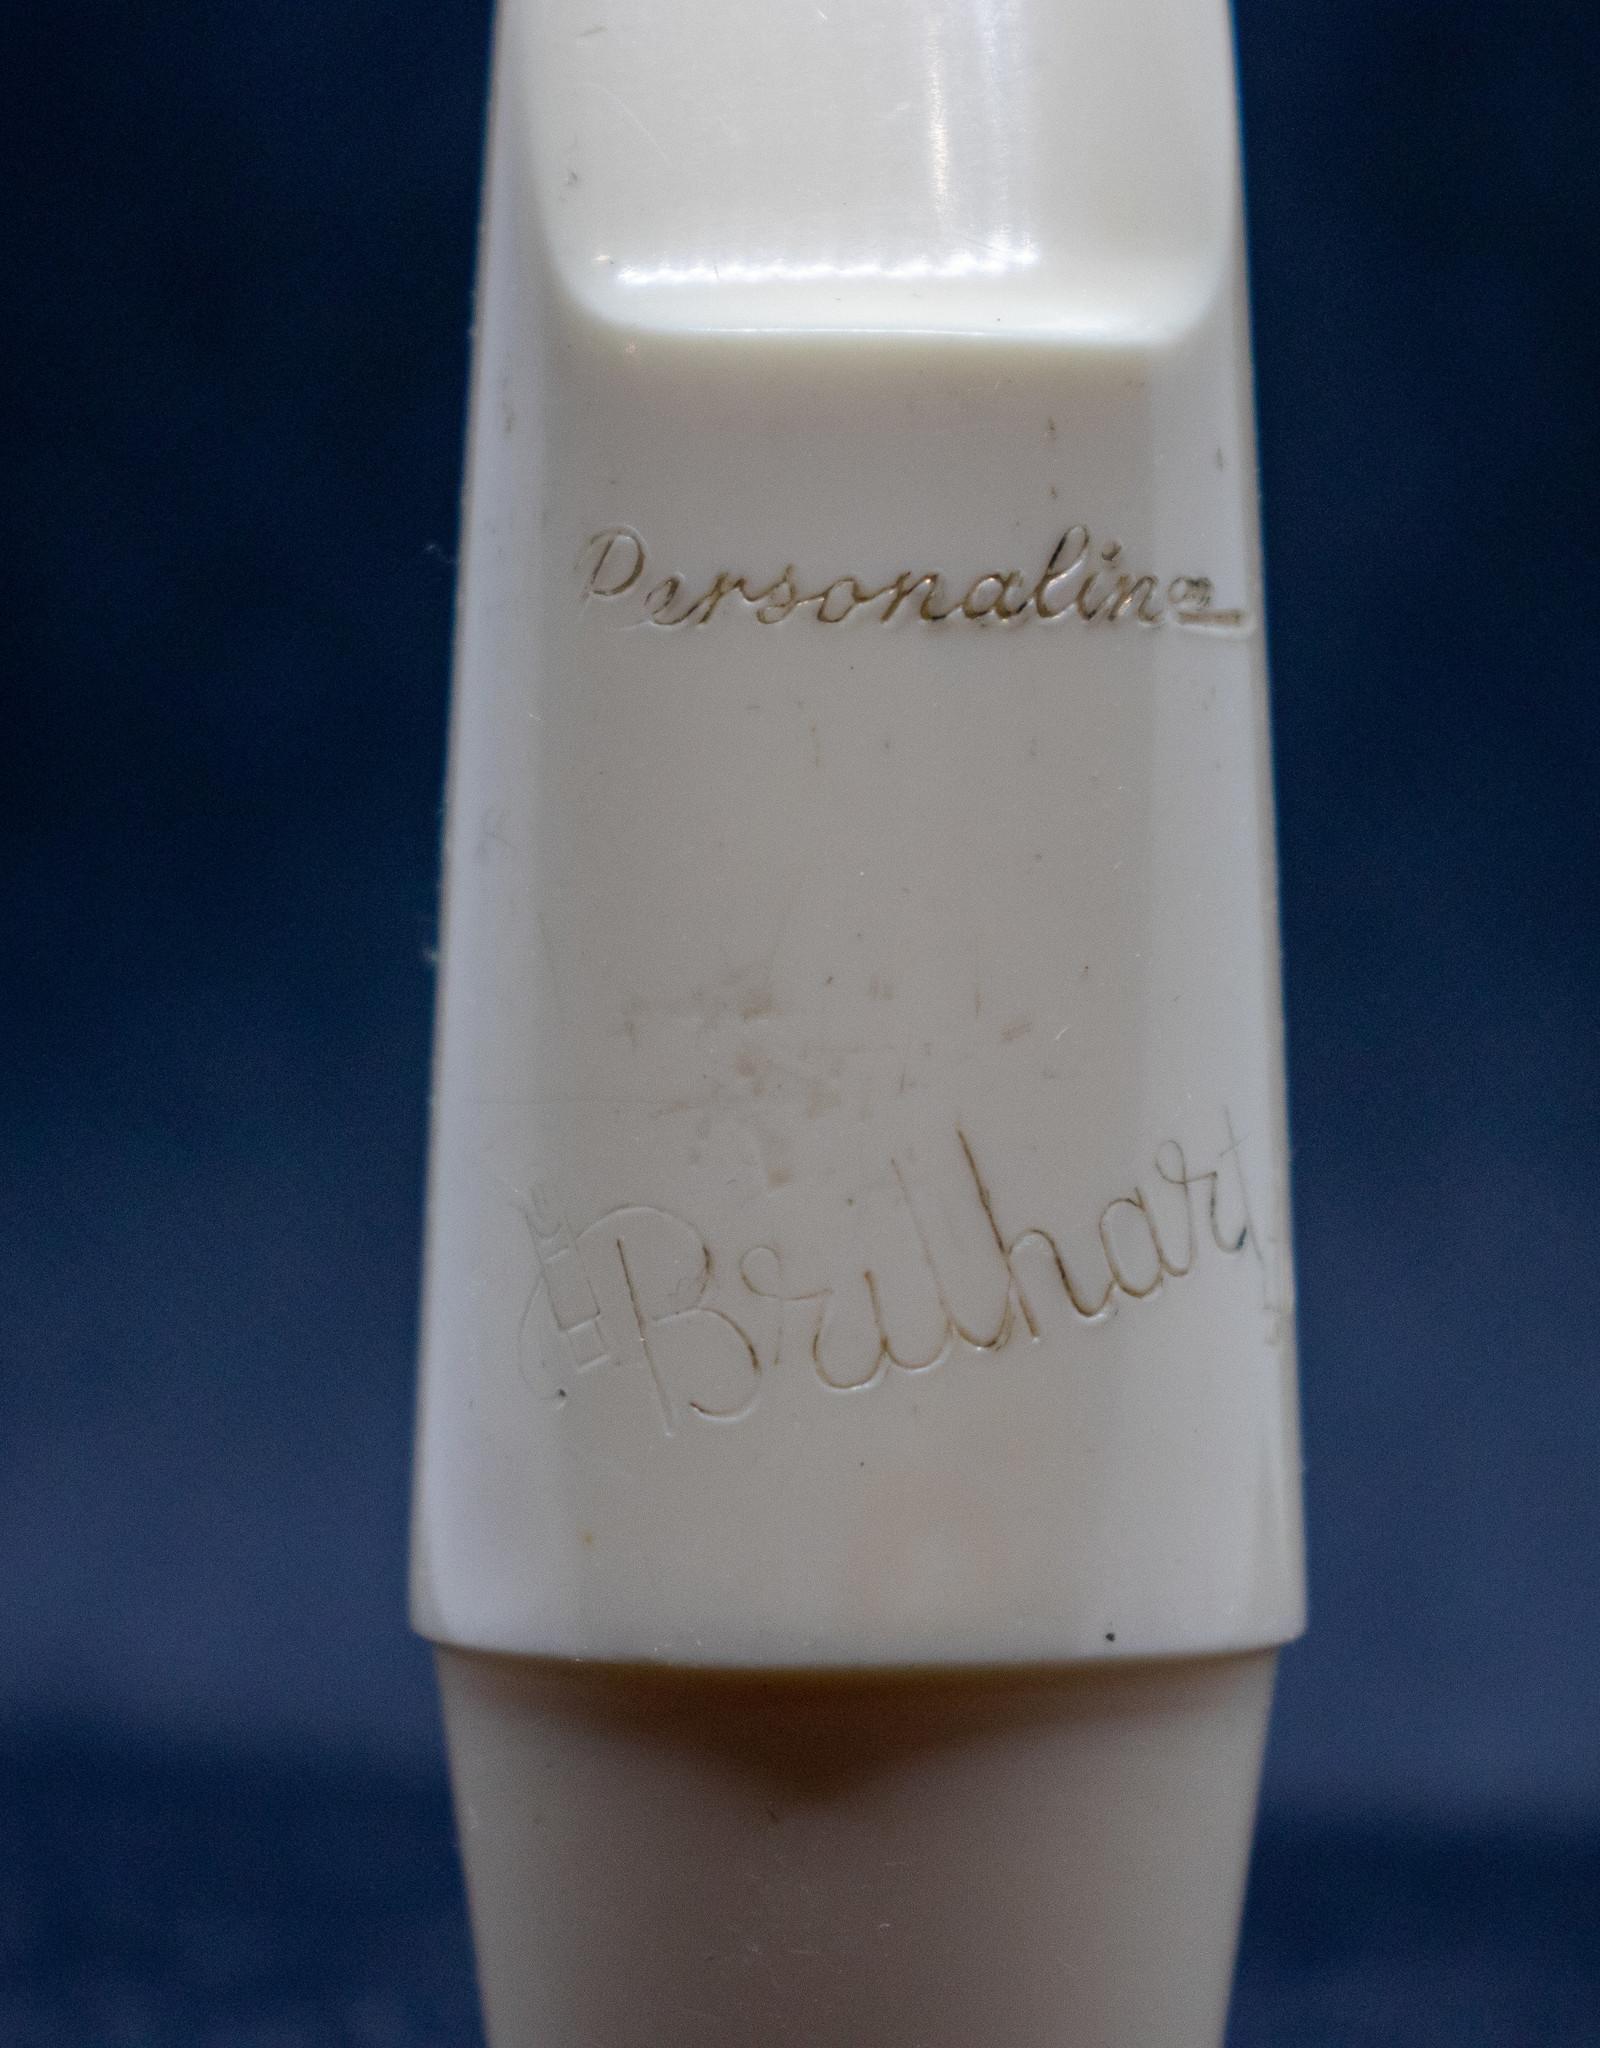 Brilhart Vintage Tonalin Brilhart L5 Personaline Tenor Saxophone Mouthpiece